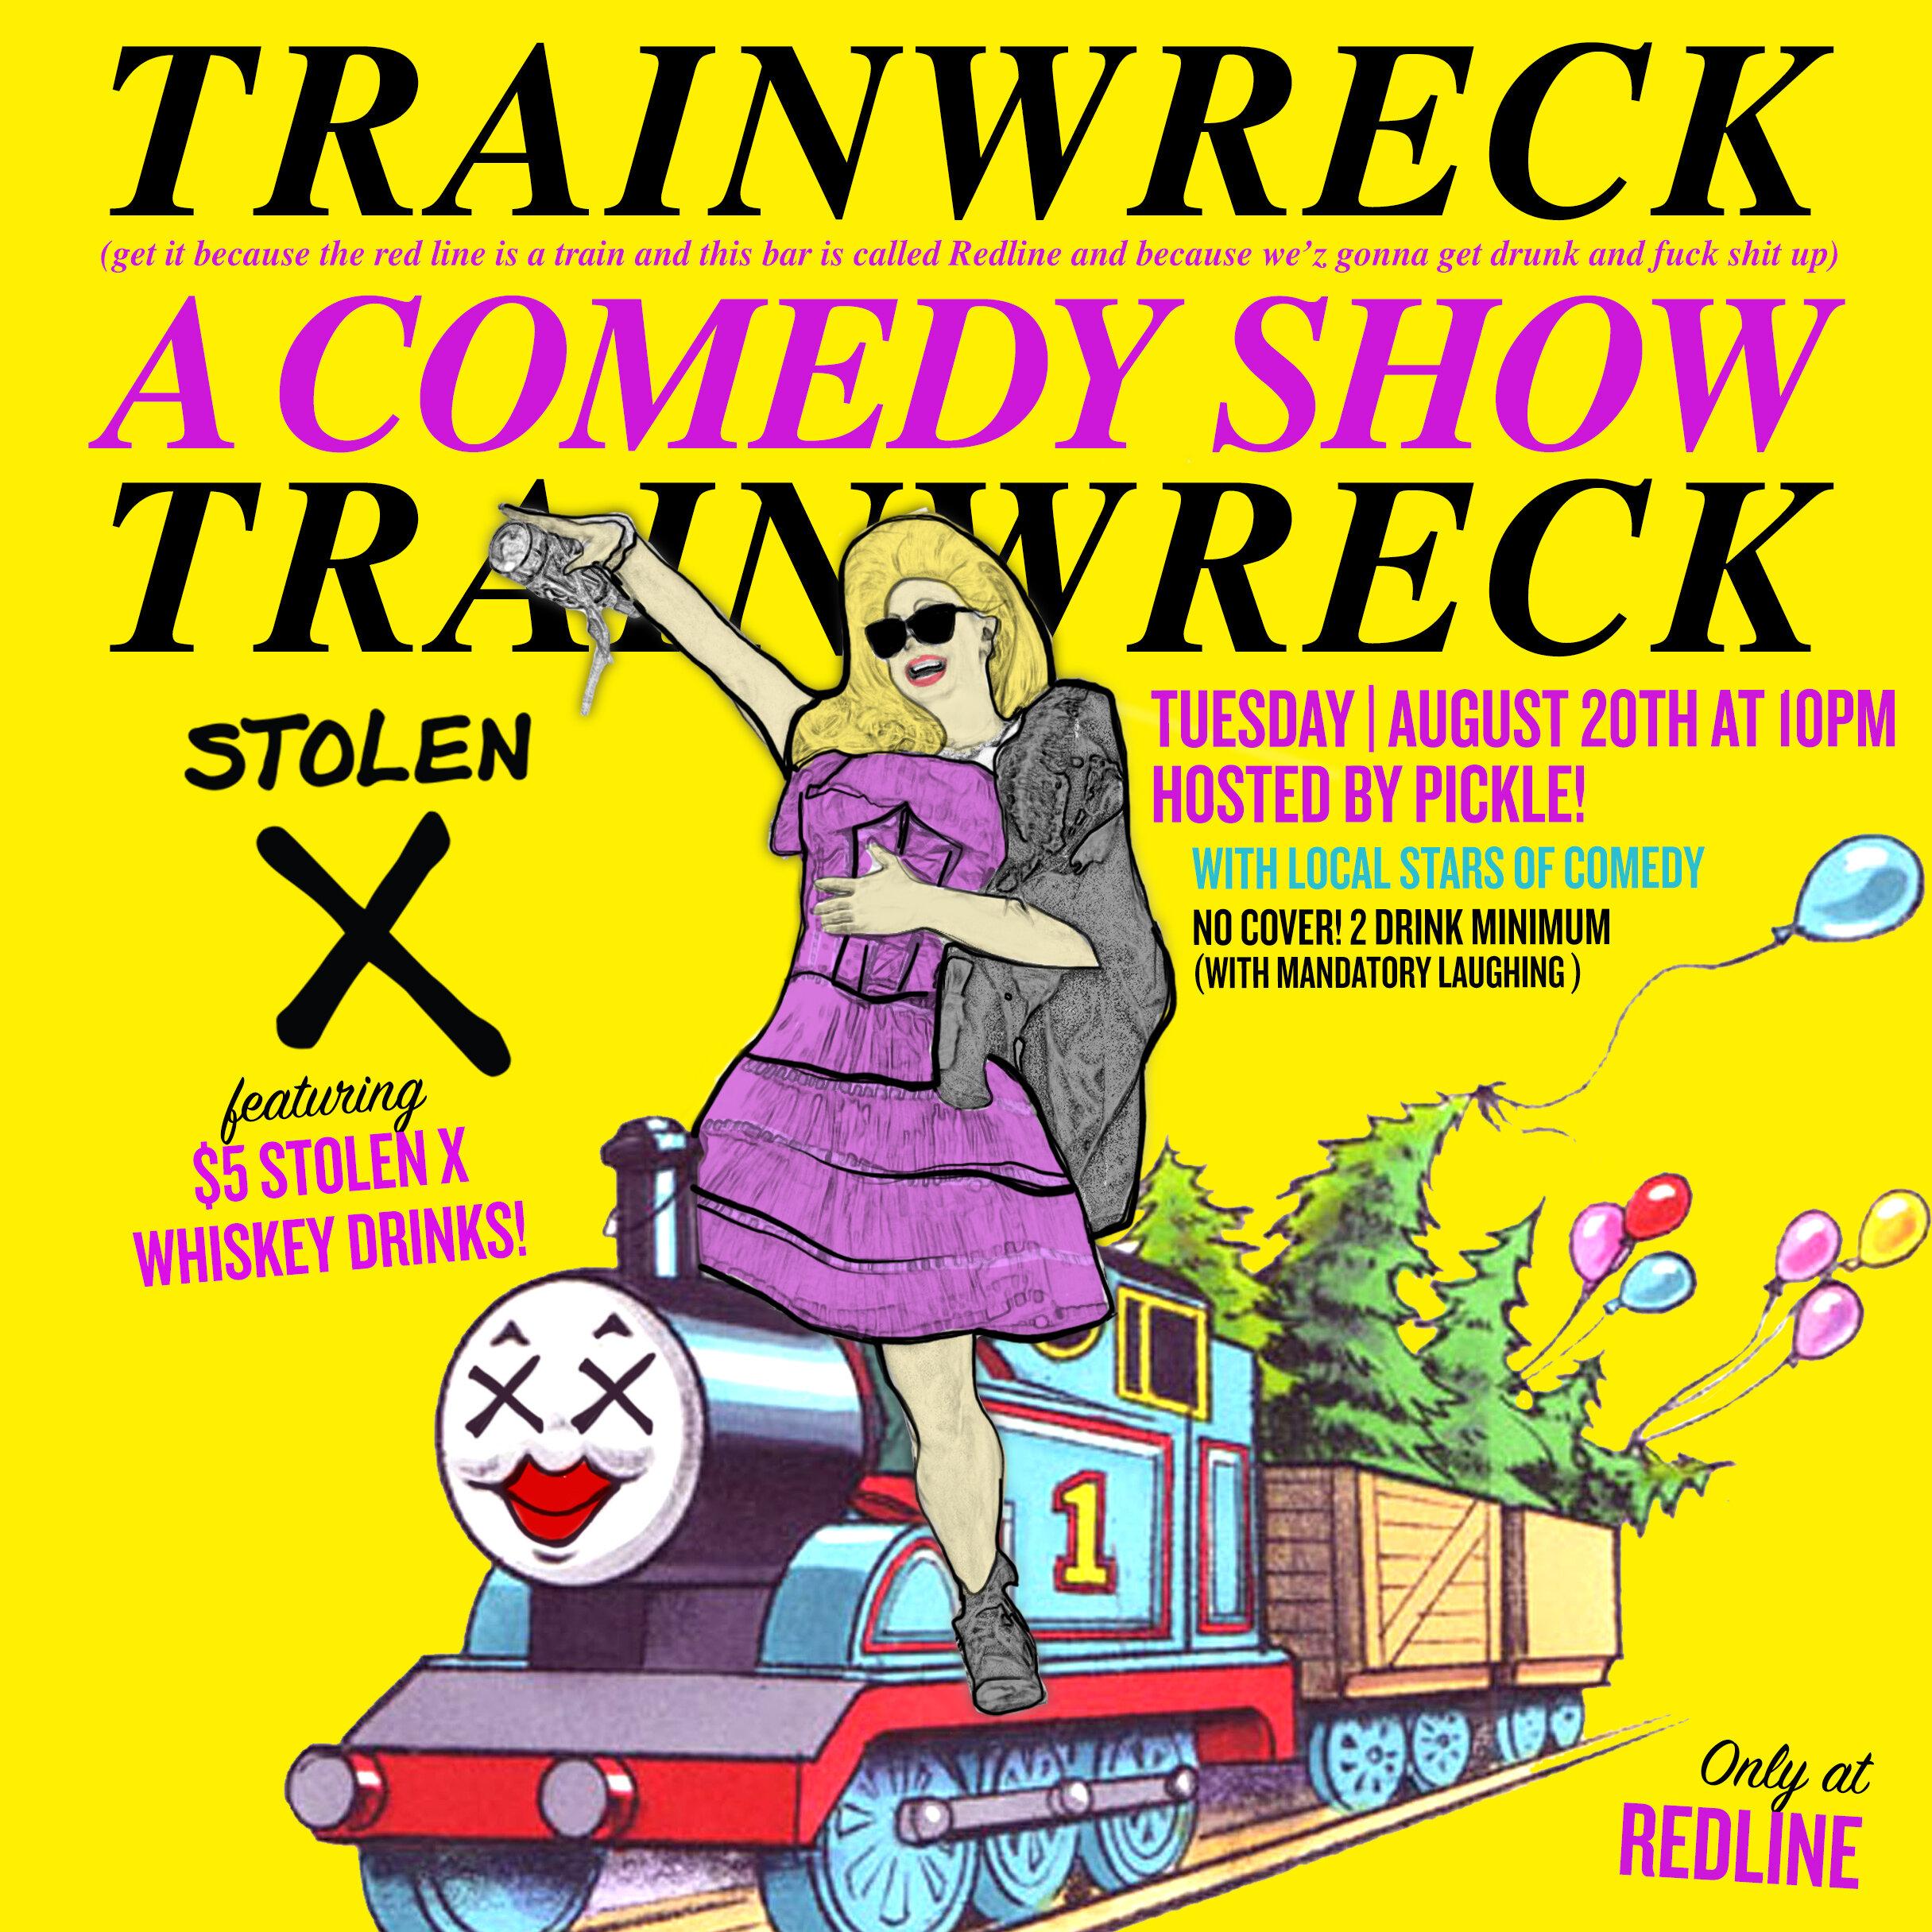 TrainwreckComedy_IG_August.jpg